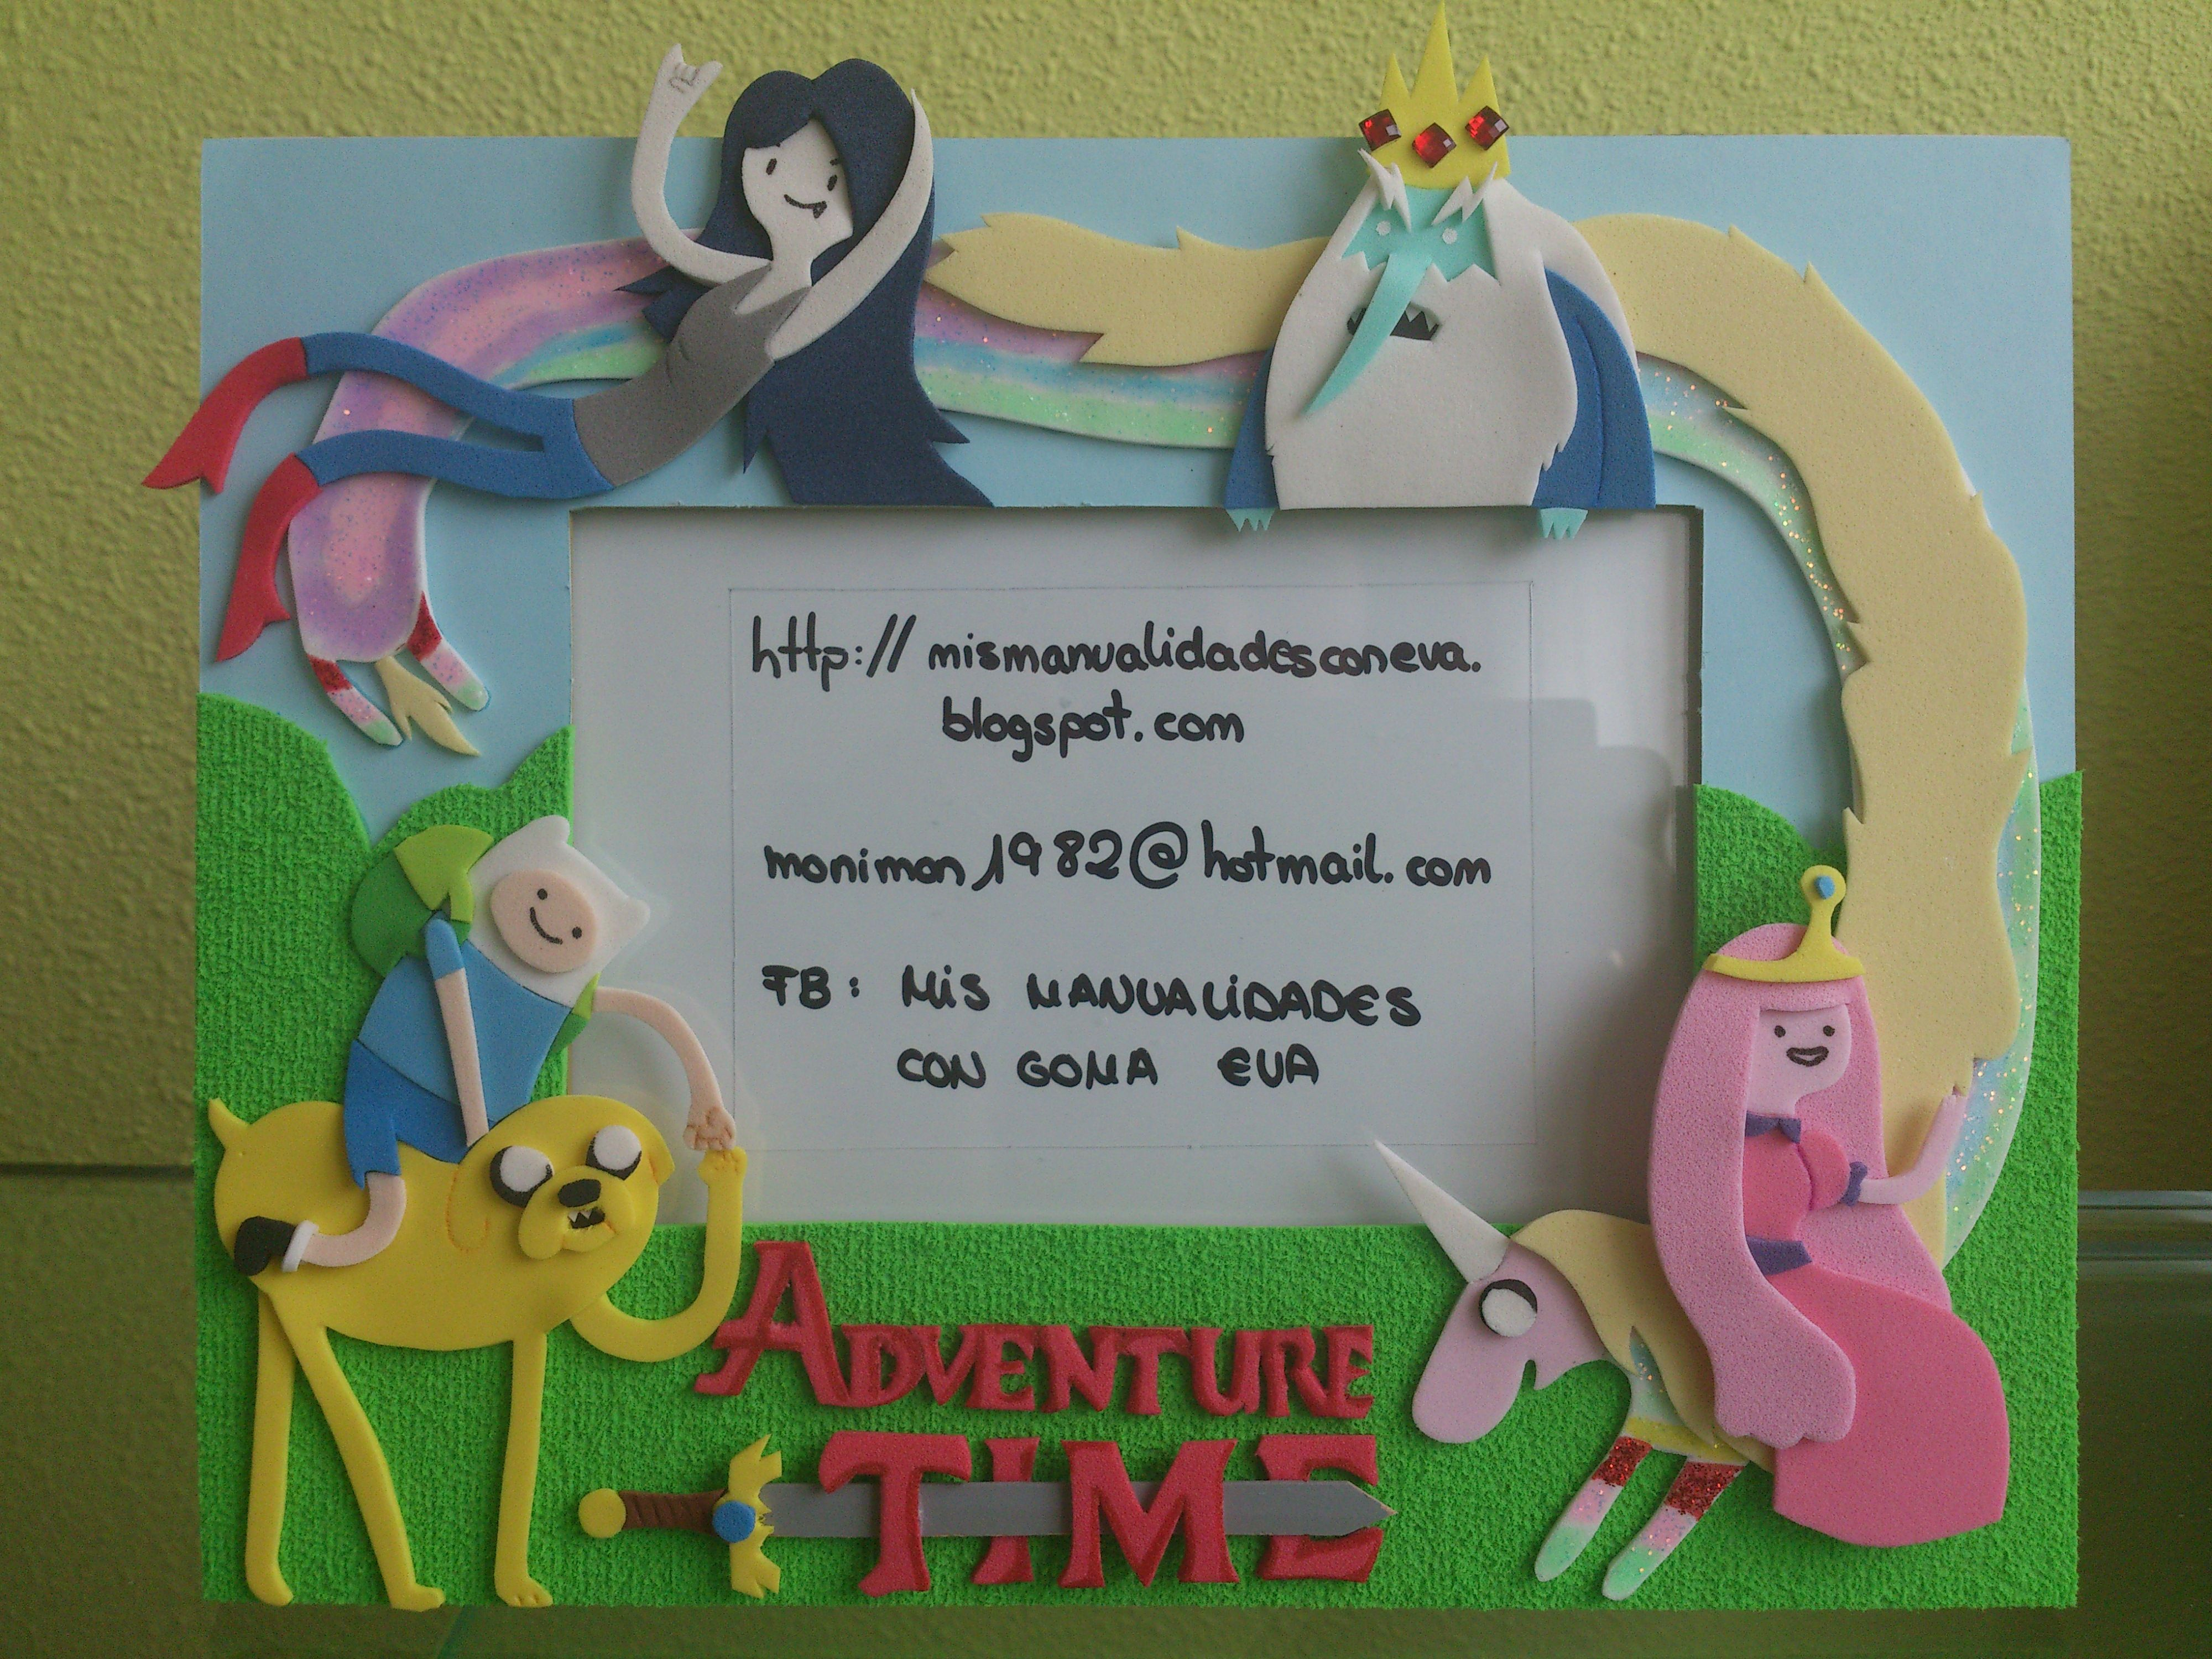 Marco de fotos hora de aventuras marcos de fotos pinterest marco de fotos hora de aventuras altavistaventures Image collections